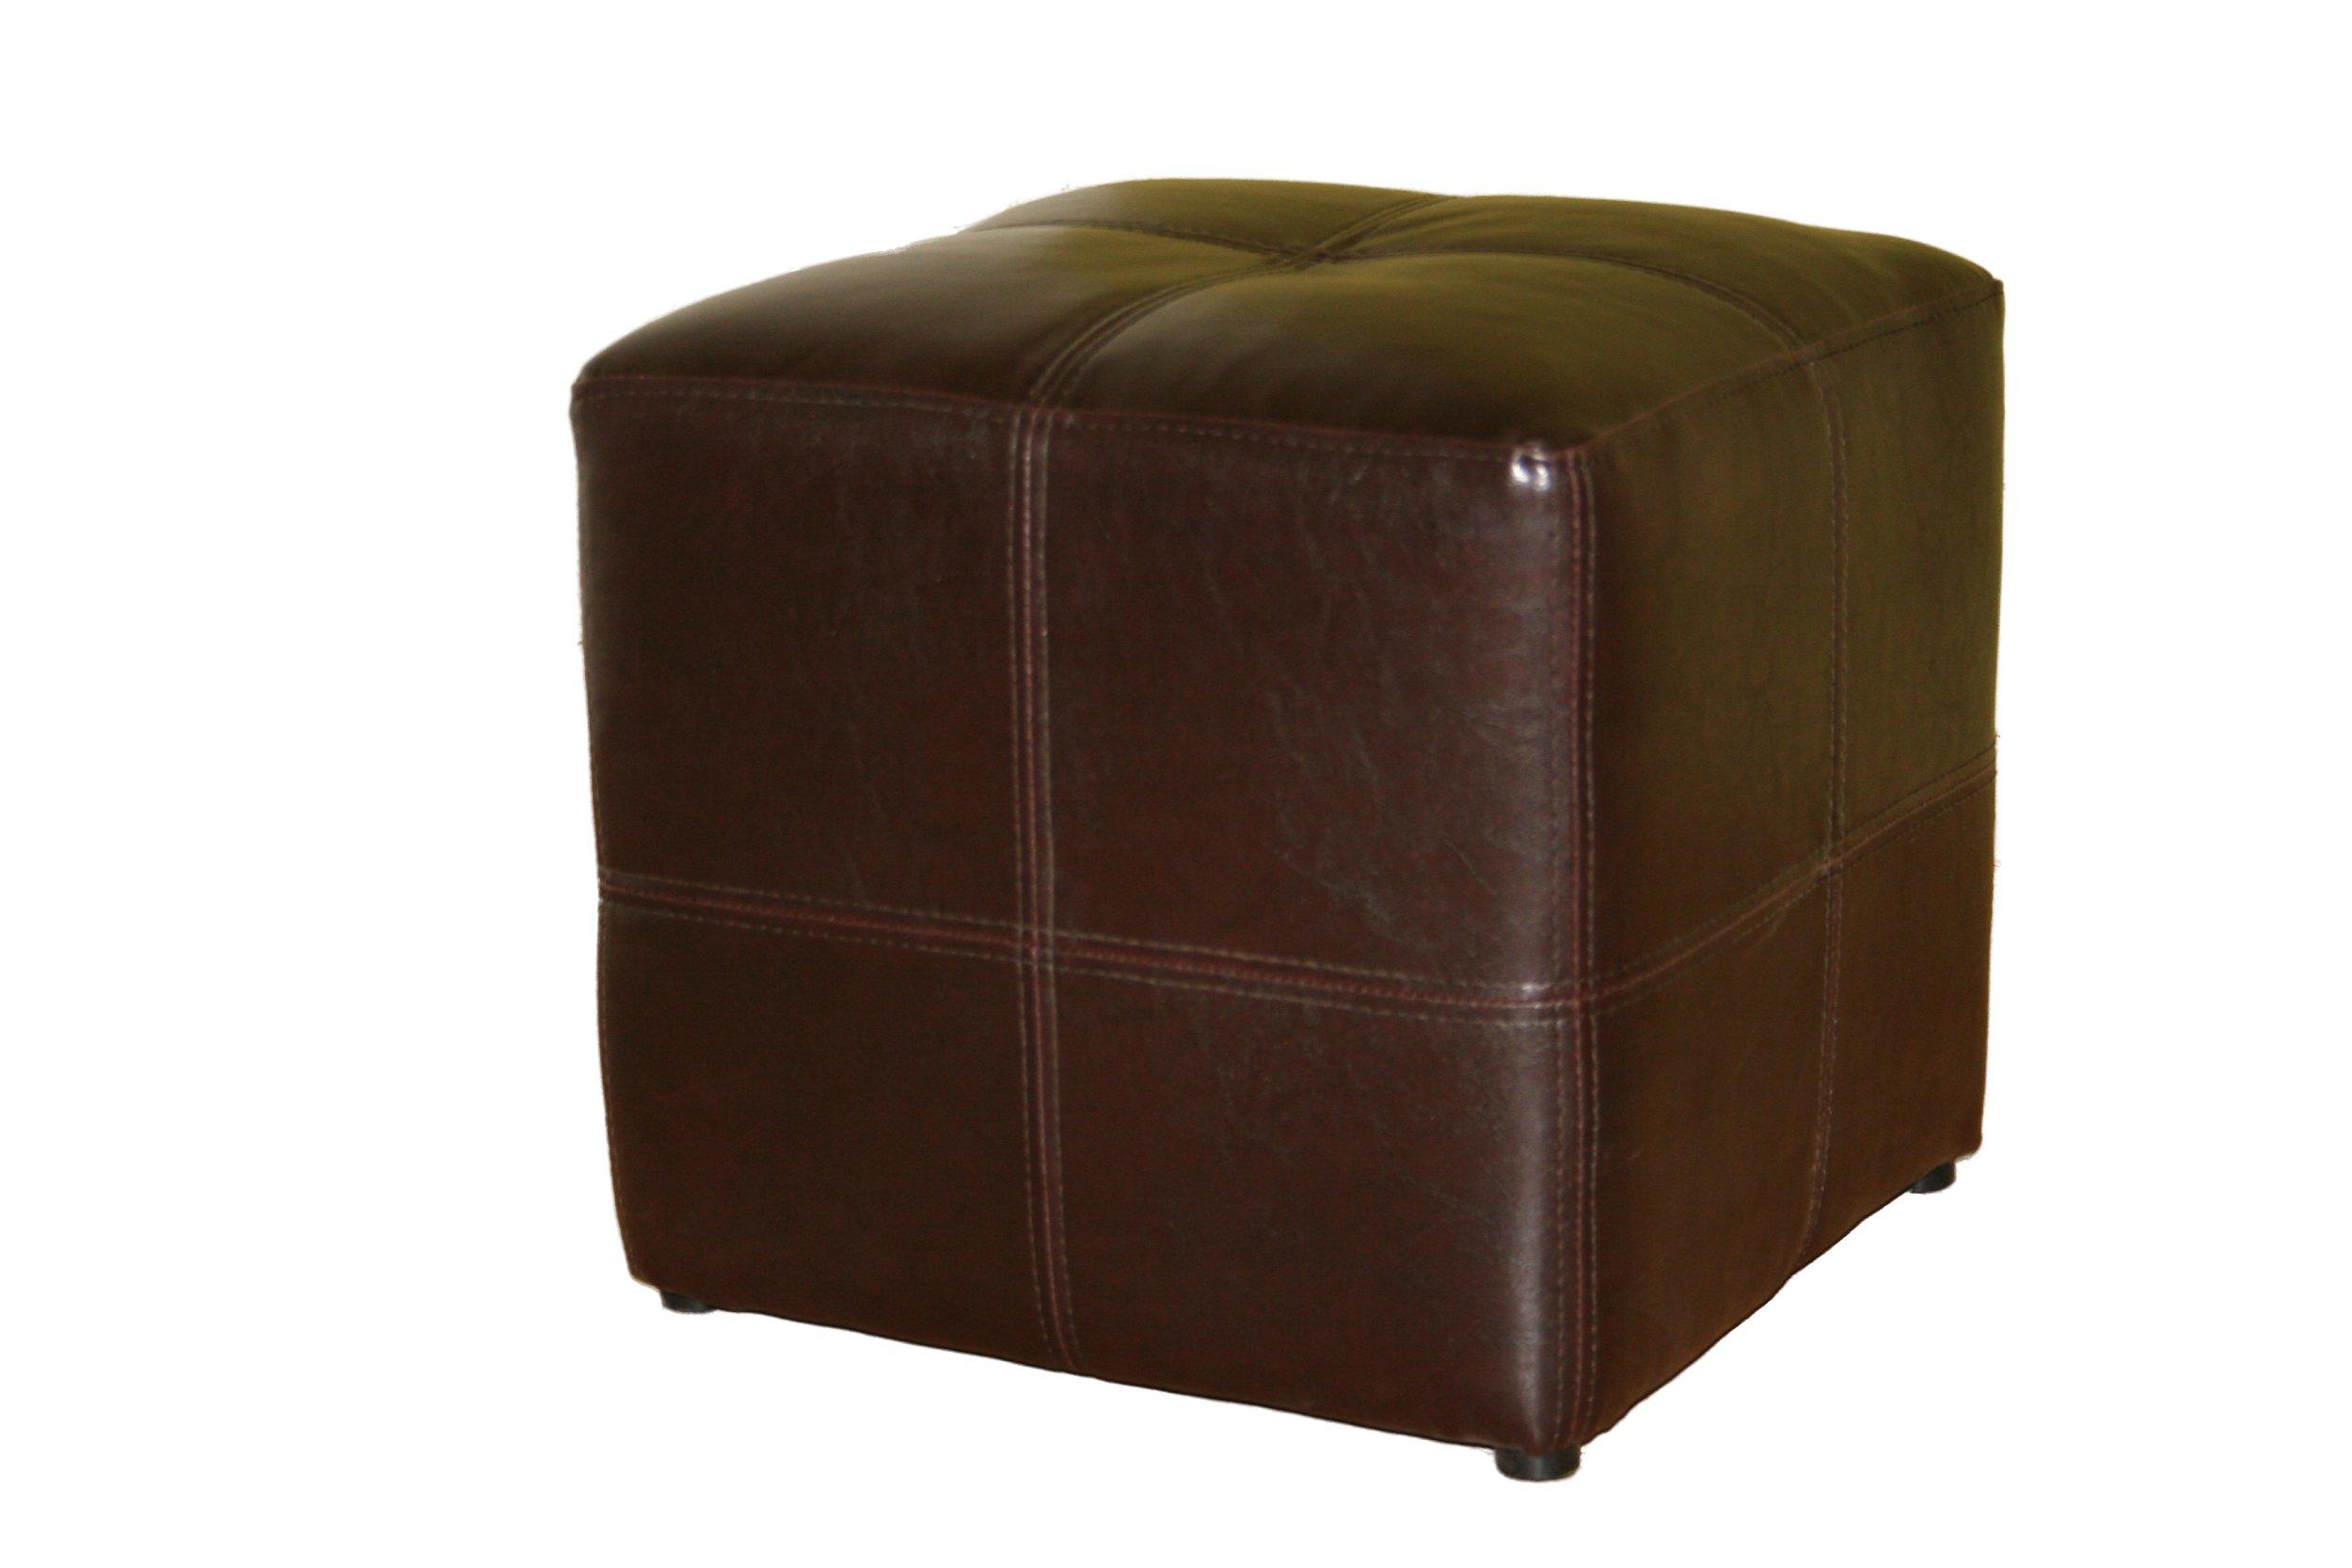 Baxton studio nox brown leather ottoman for Baxton studio